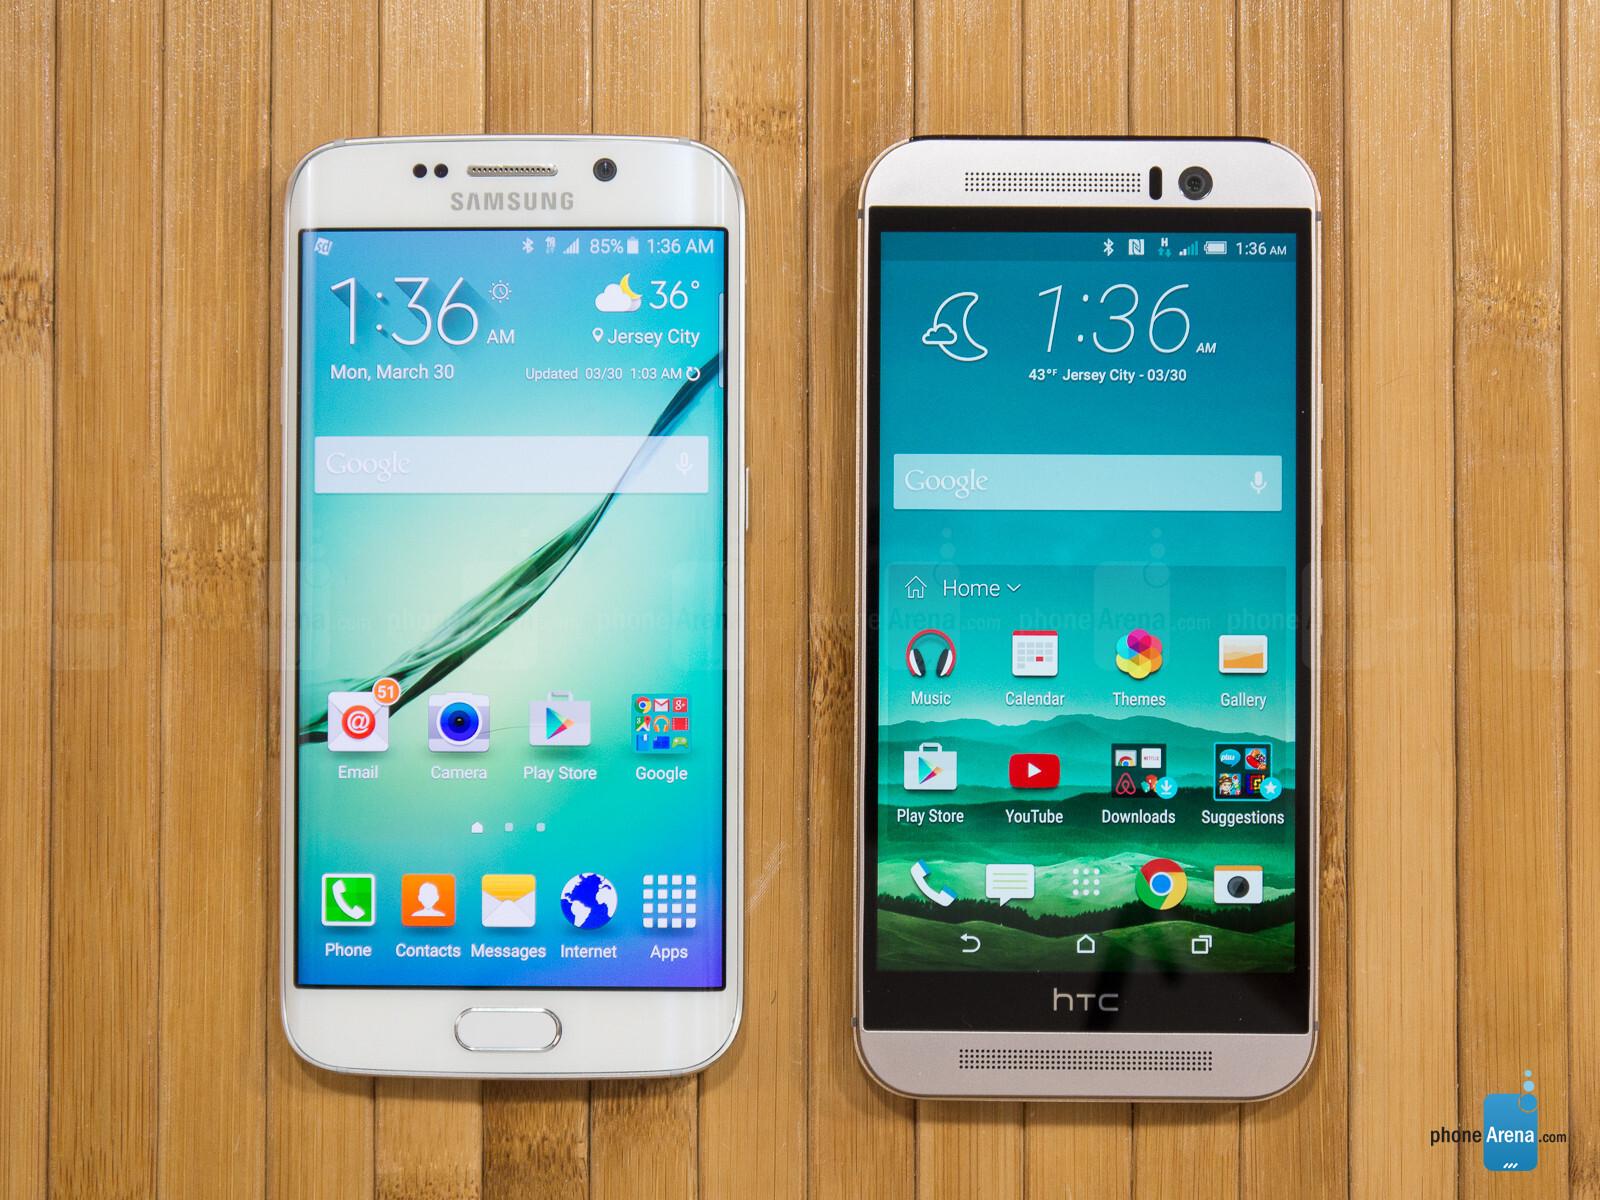 Samsung galaxy note 5 vs htc one m9 plus a comparison - Samsung Galaxy S6 Edge Vs Htc One M9